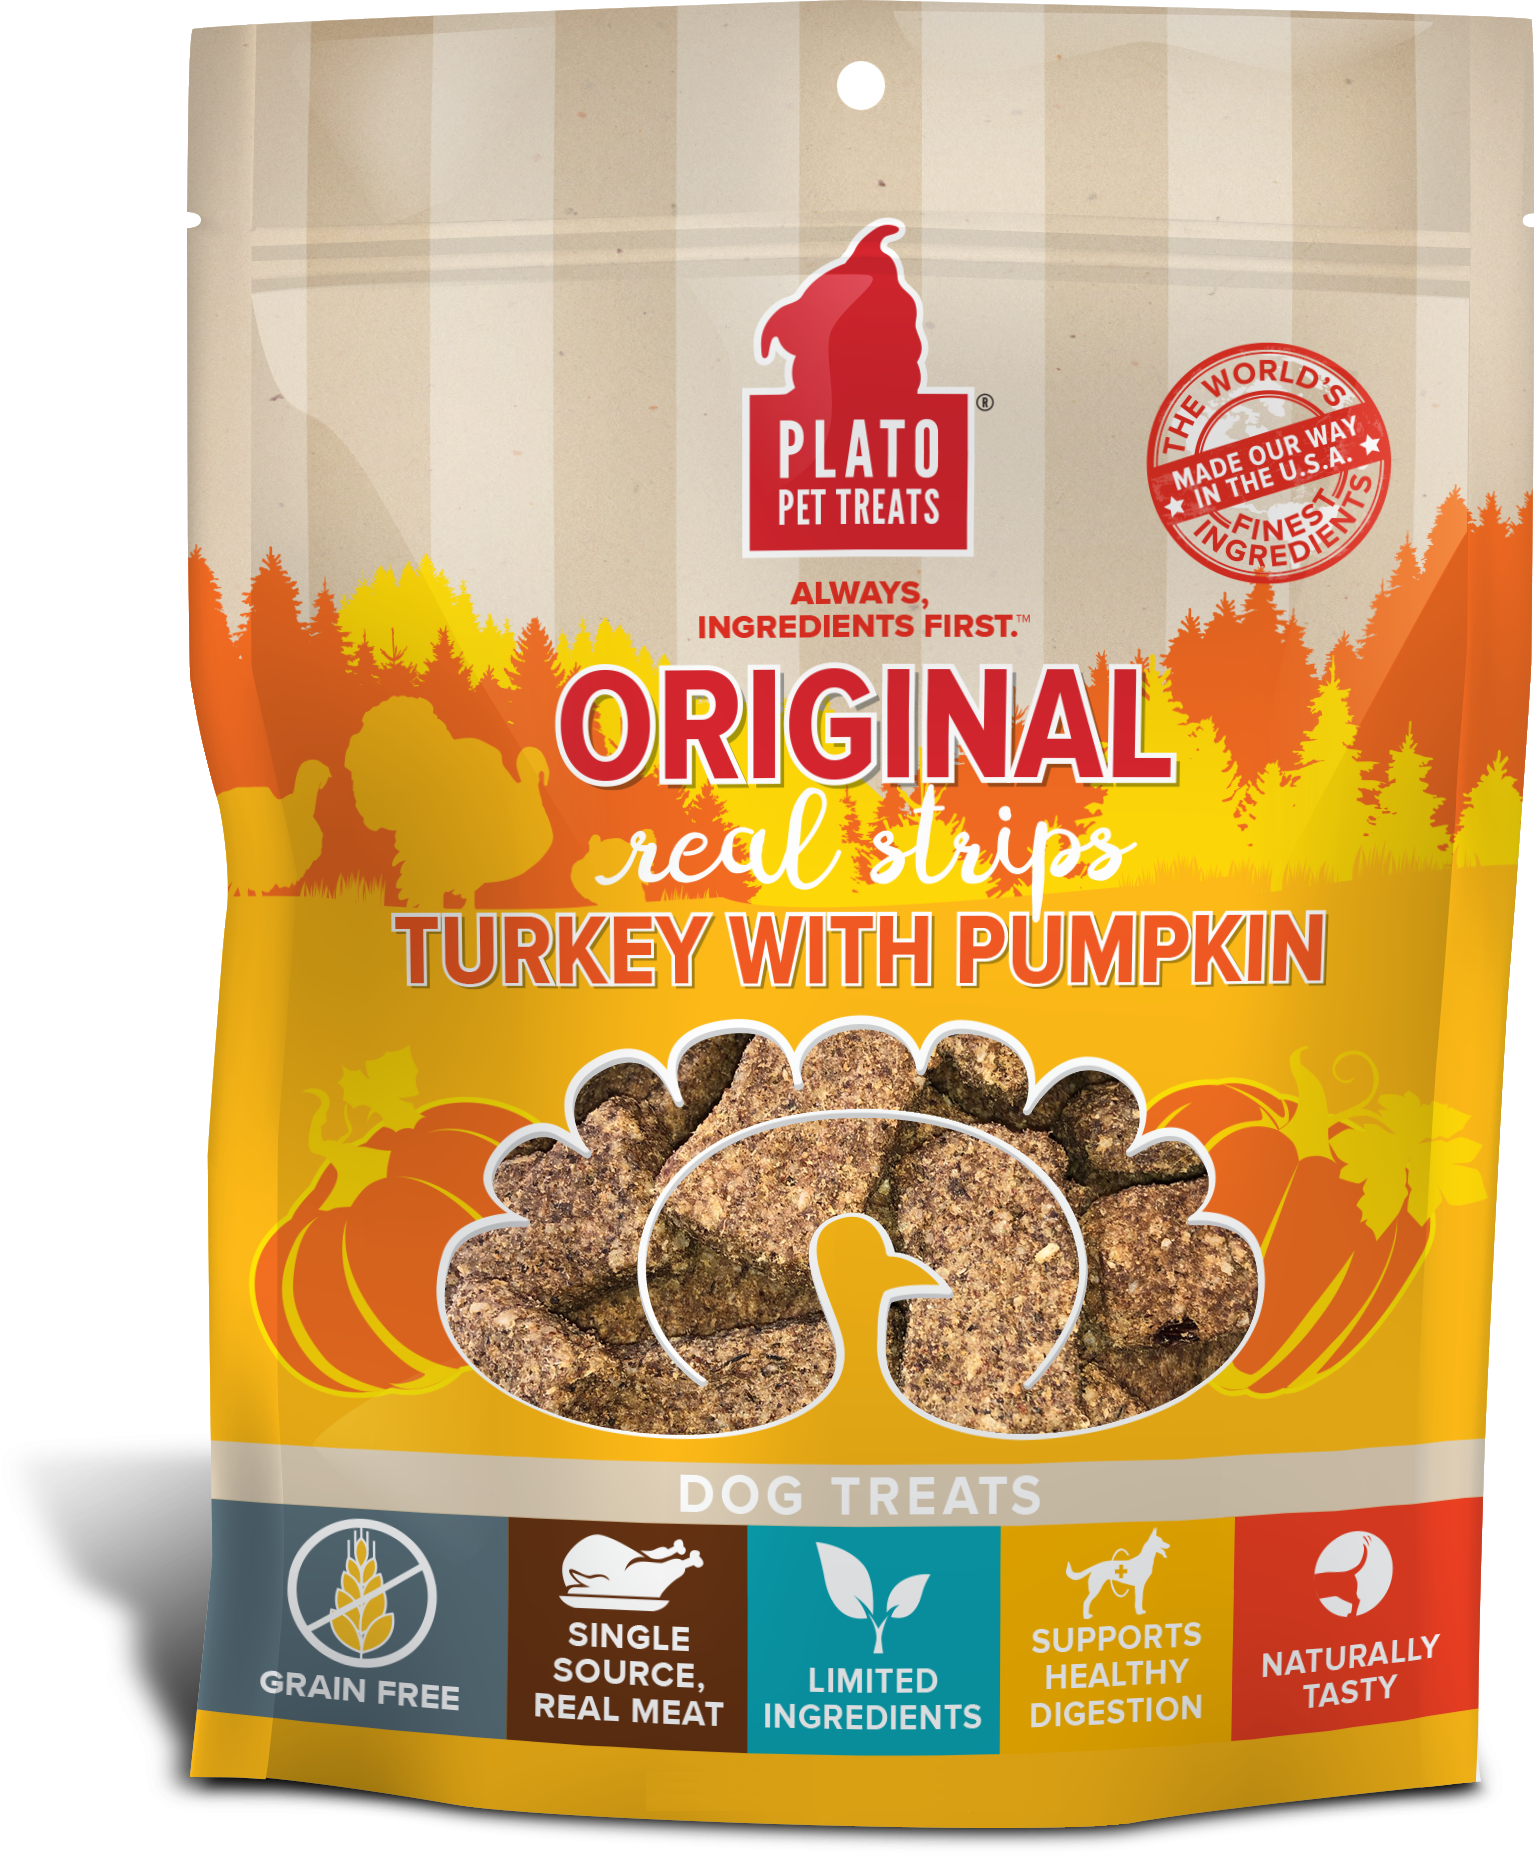 Plato Original Real Strips Turkey With Pumpkin Potato Dog Treat Image